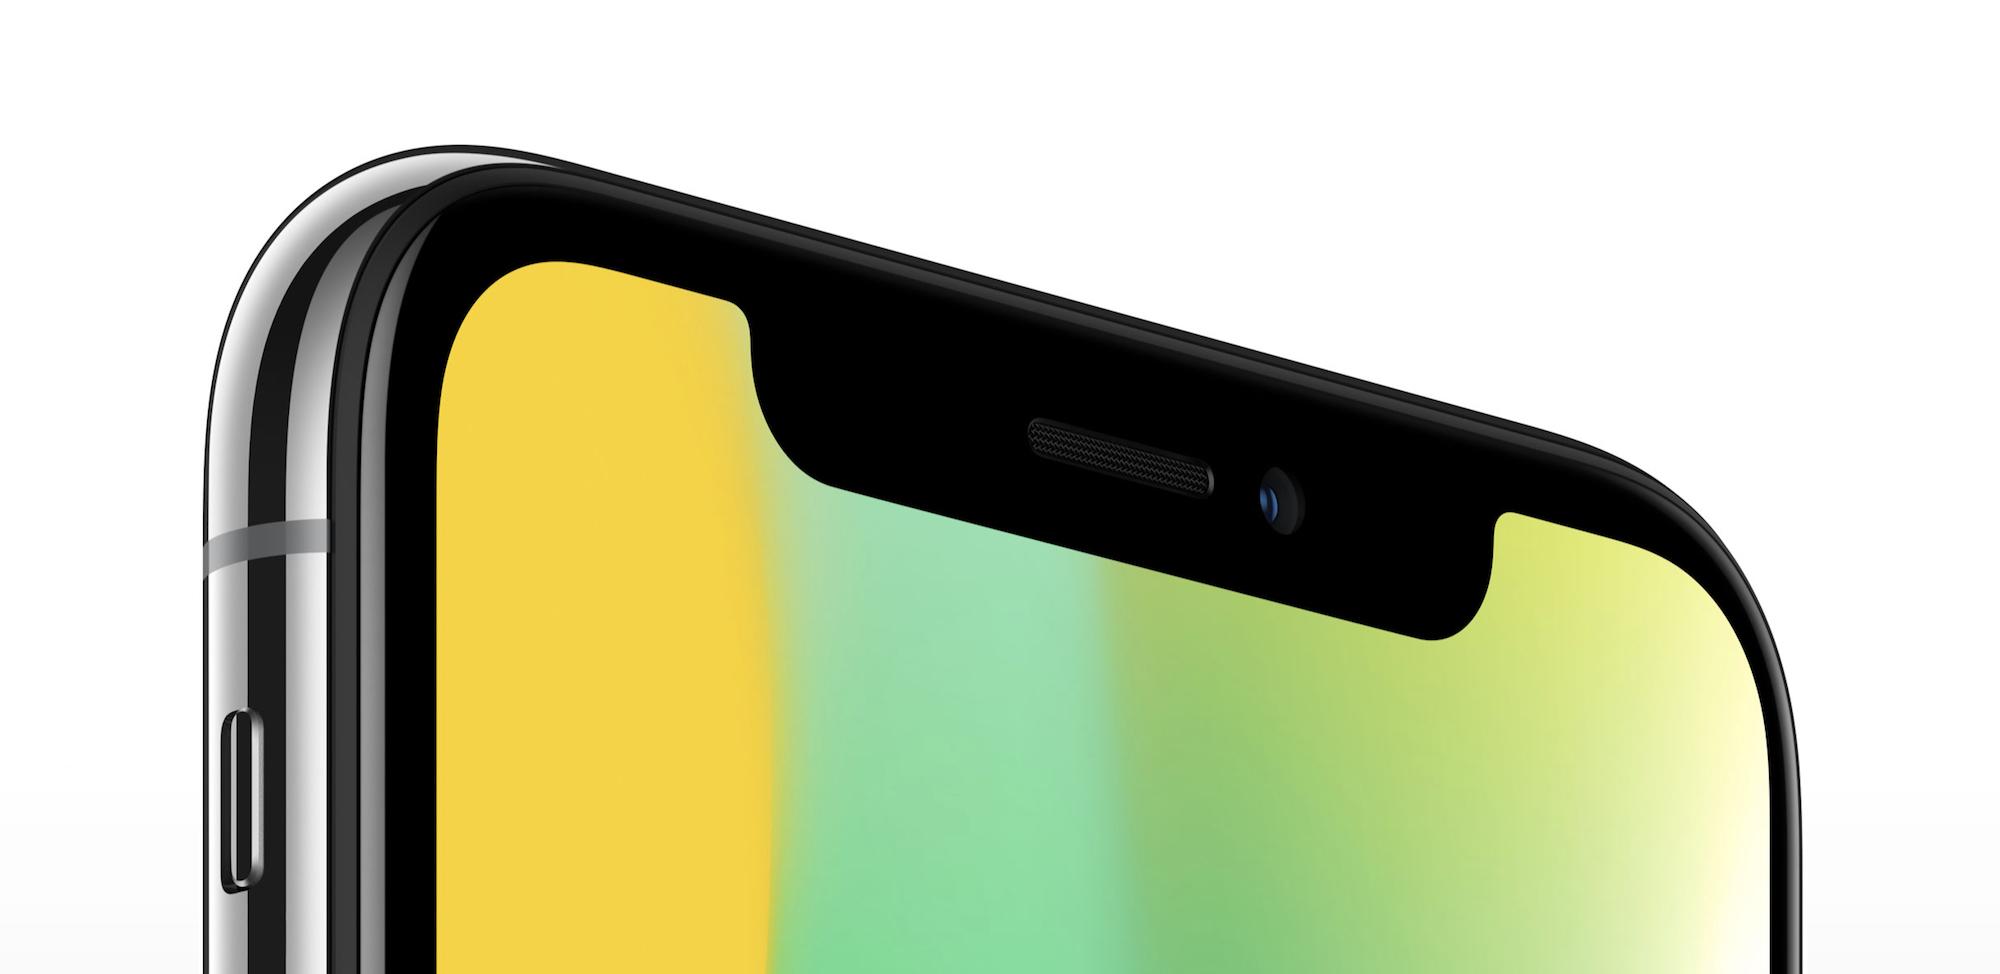 iphone-x-front.jpg